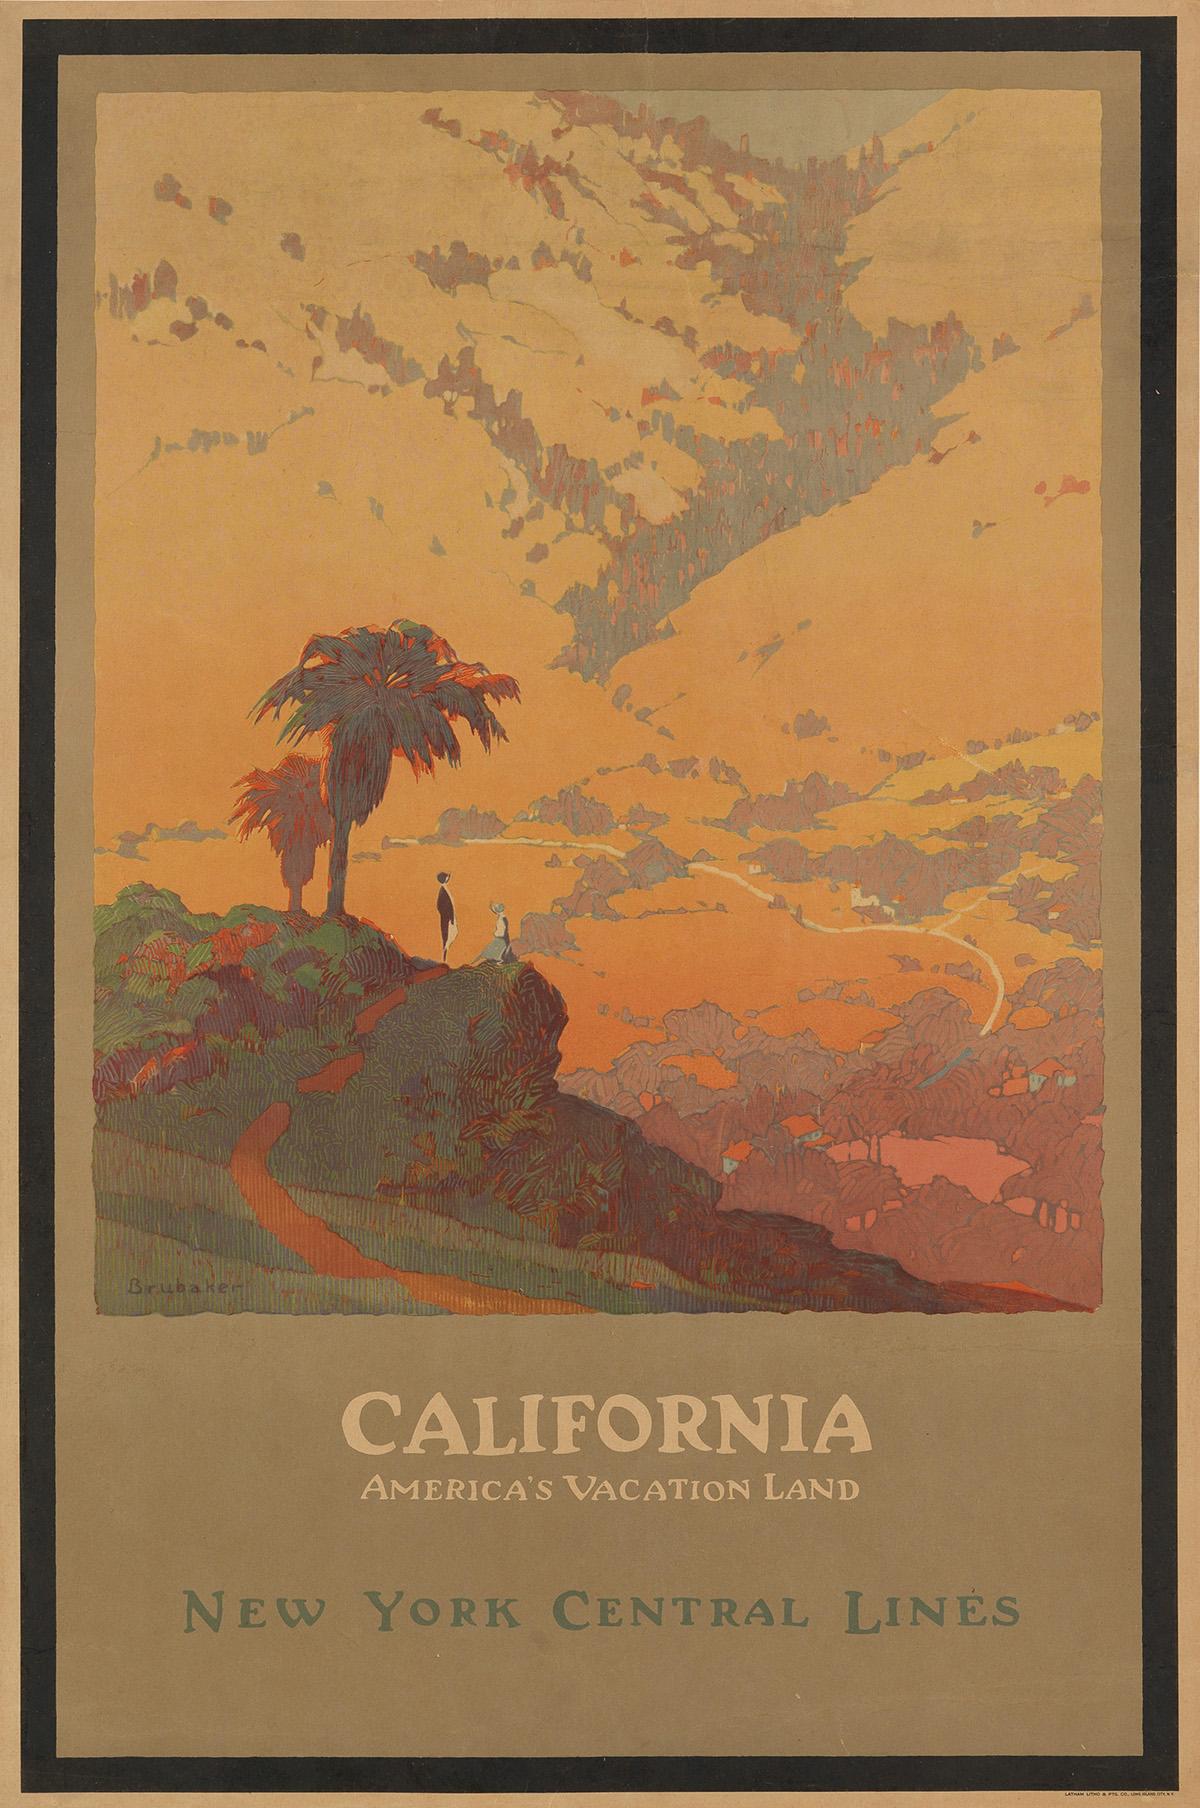 Jon O. Brubaker (1875-?).  CALIFORNIA / AMERICAS VACATION LAND / NEW YORK CENTRAL LINES. 1925.